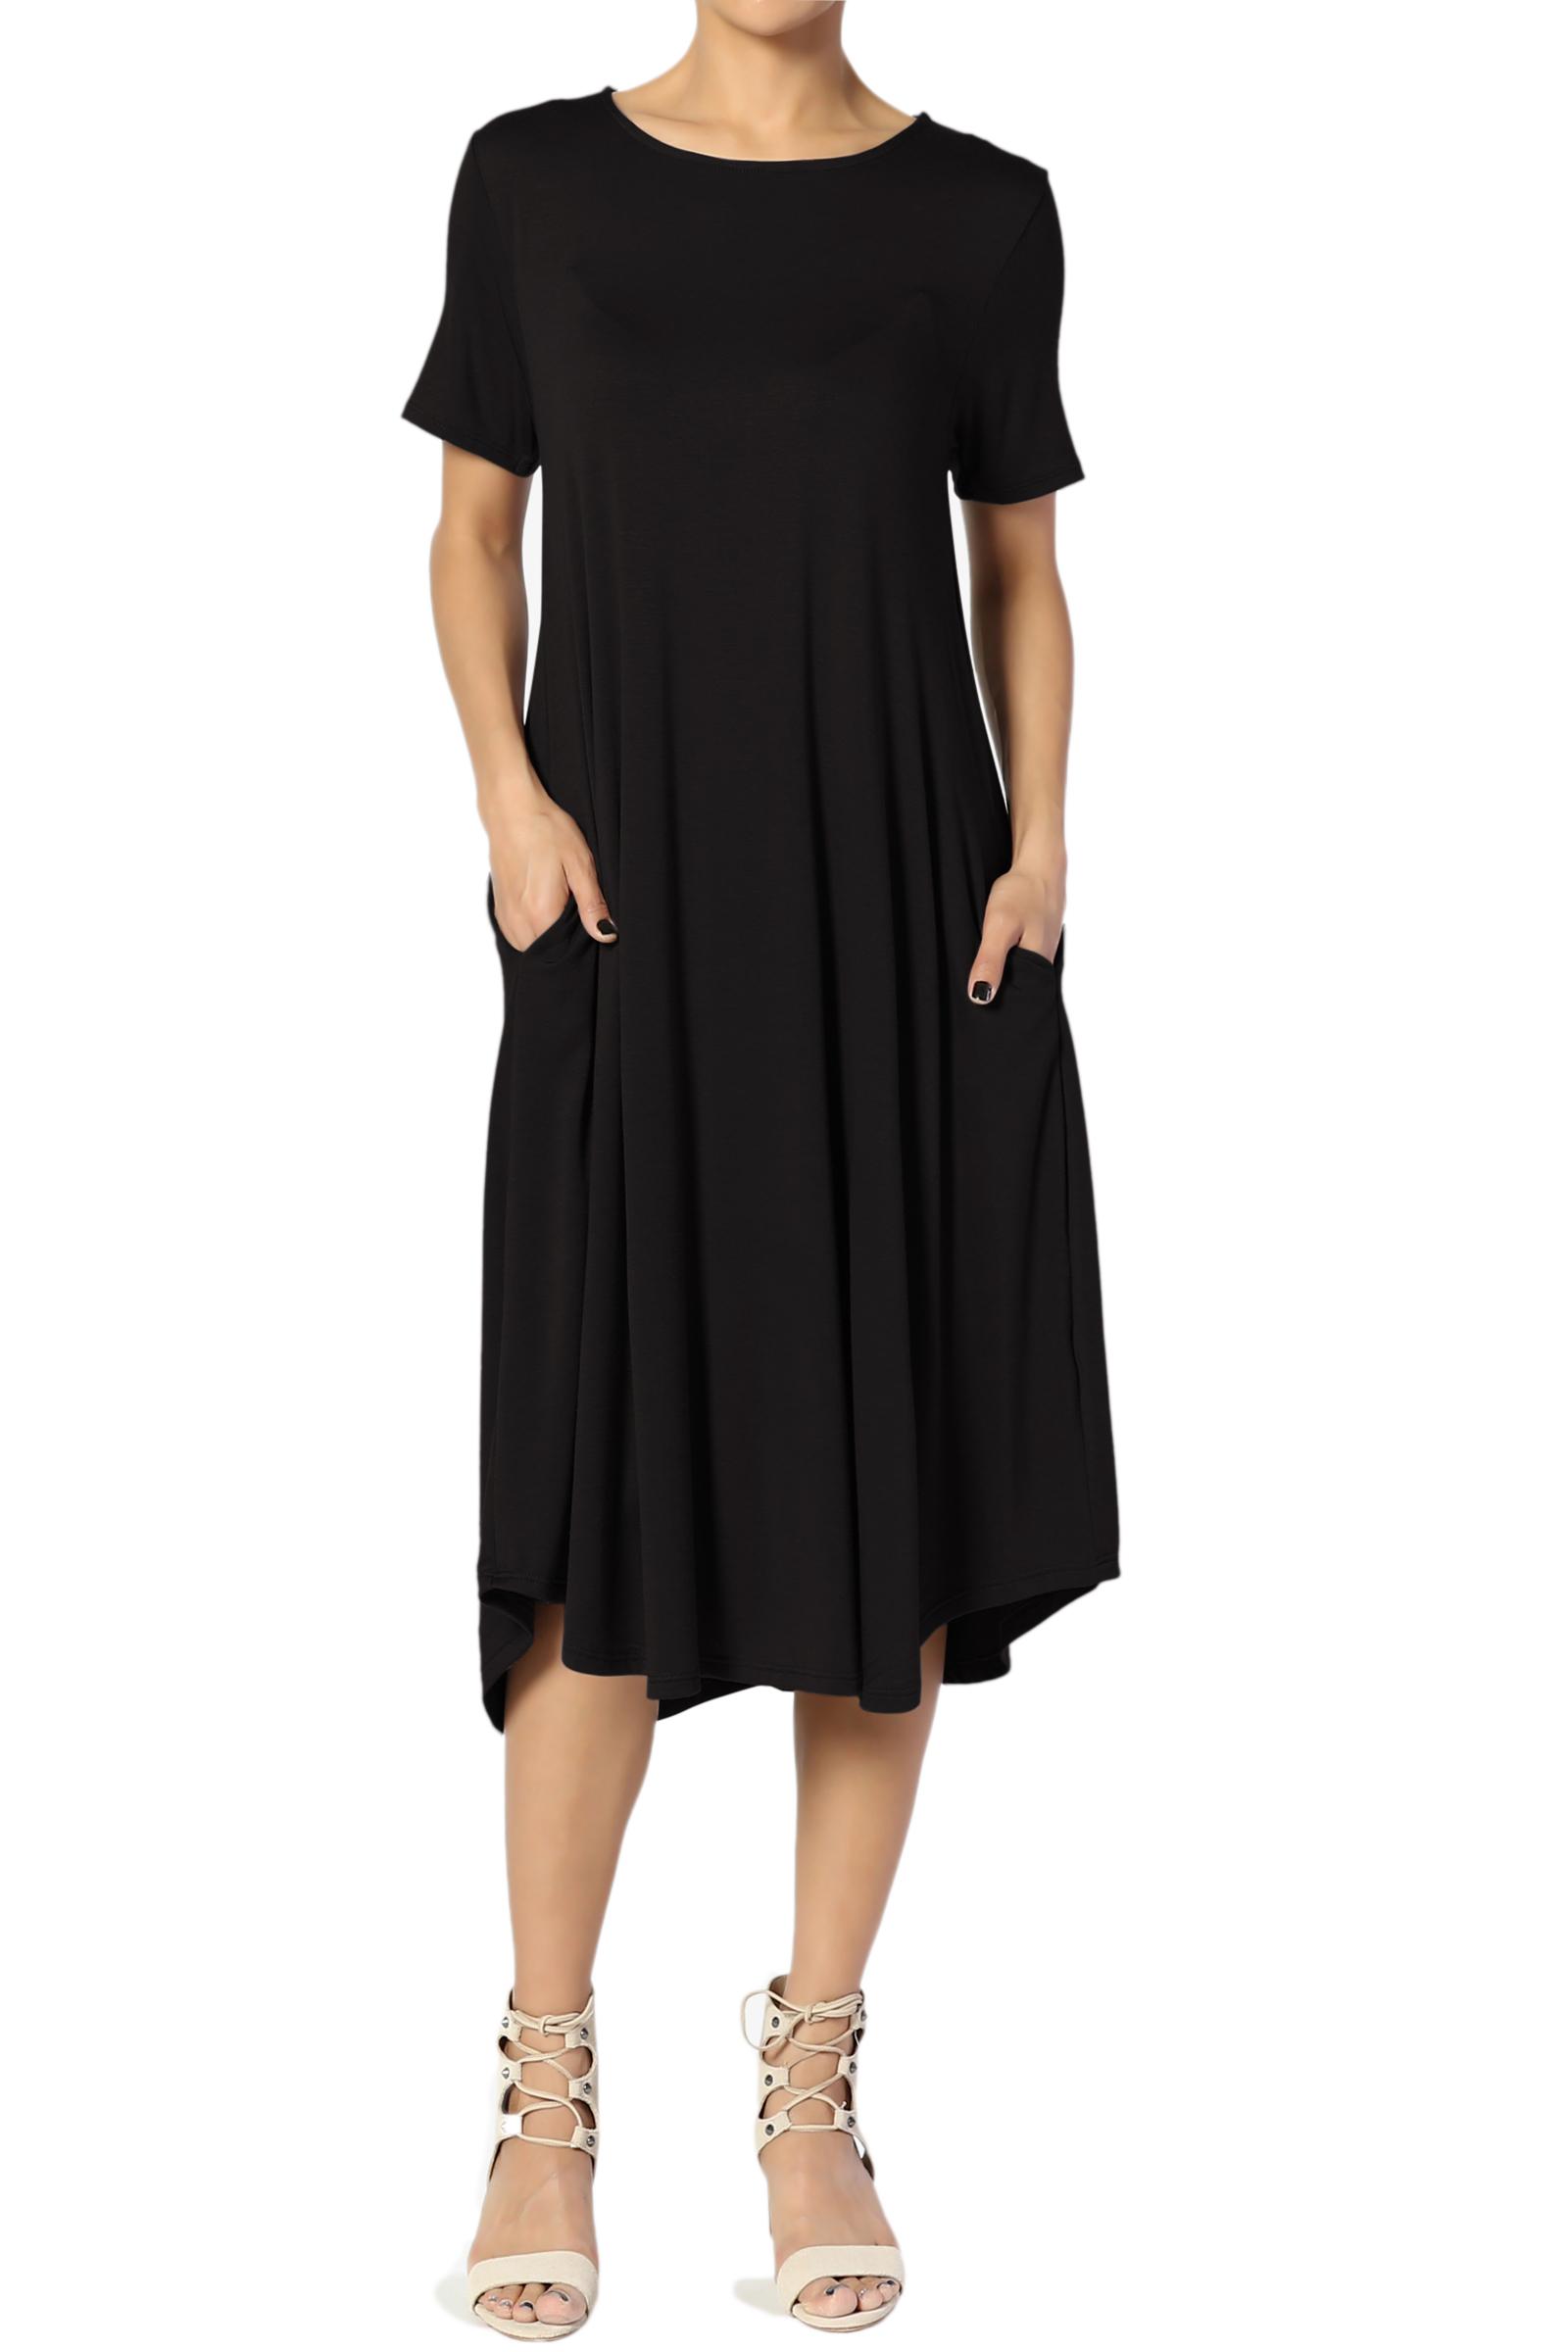 TheMogan Women's S~3X Short Sleeve Fit & Flare A-line Draped Jersey Midi Dress